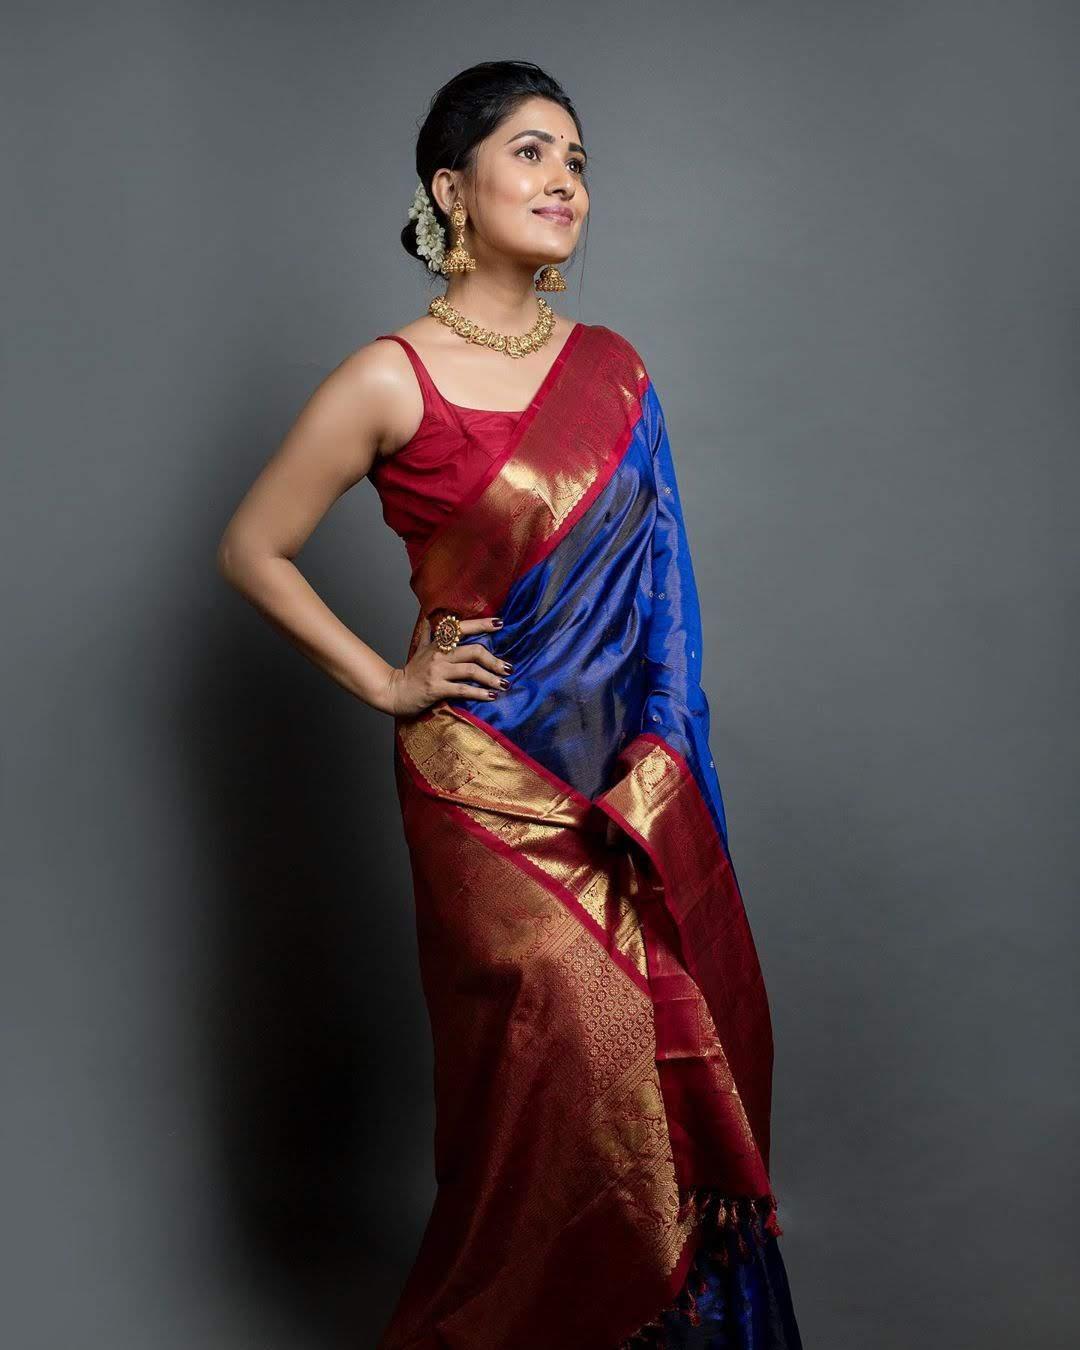 Vani-bhojan-latest-image-46